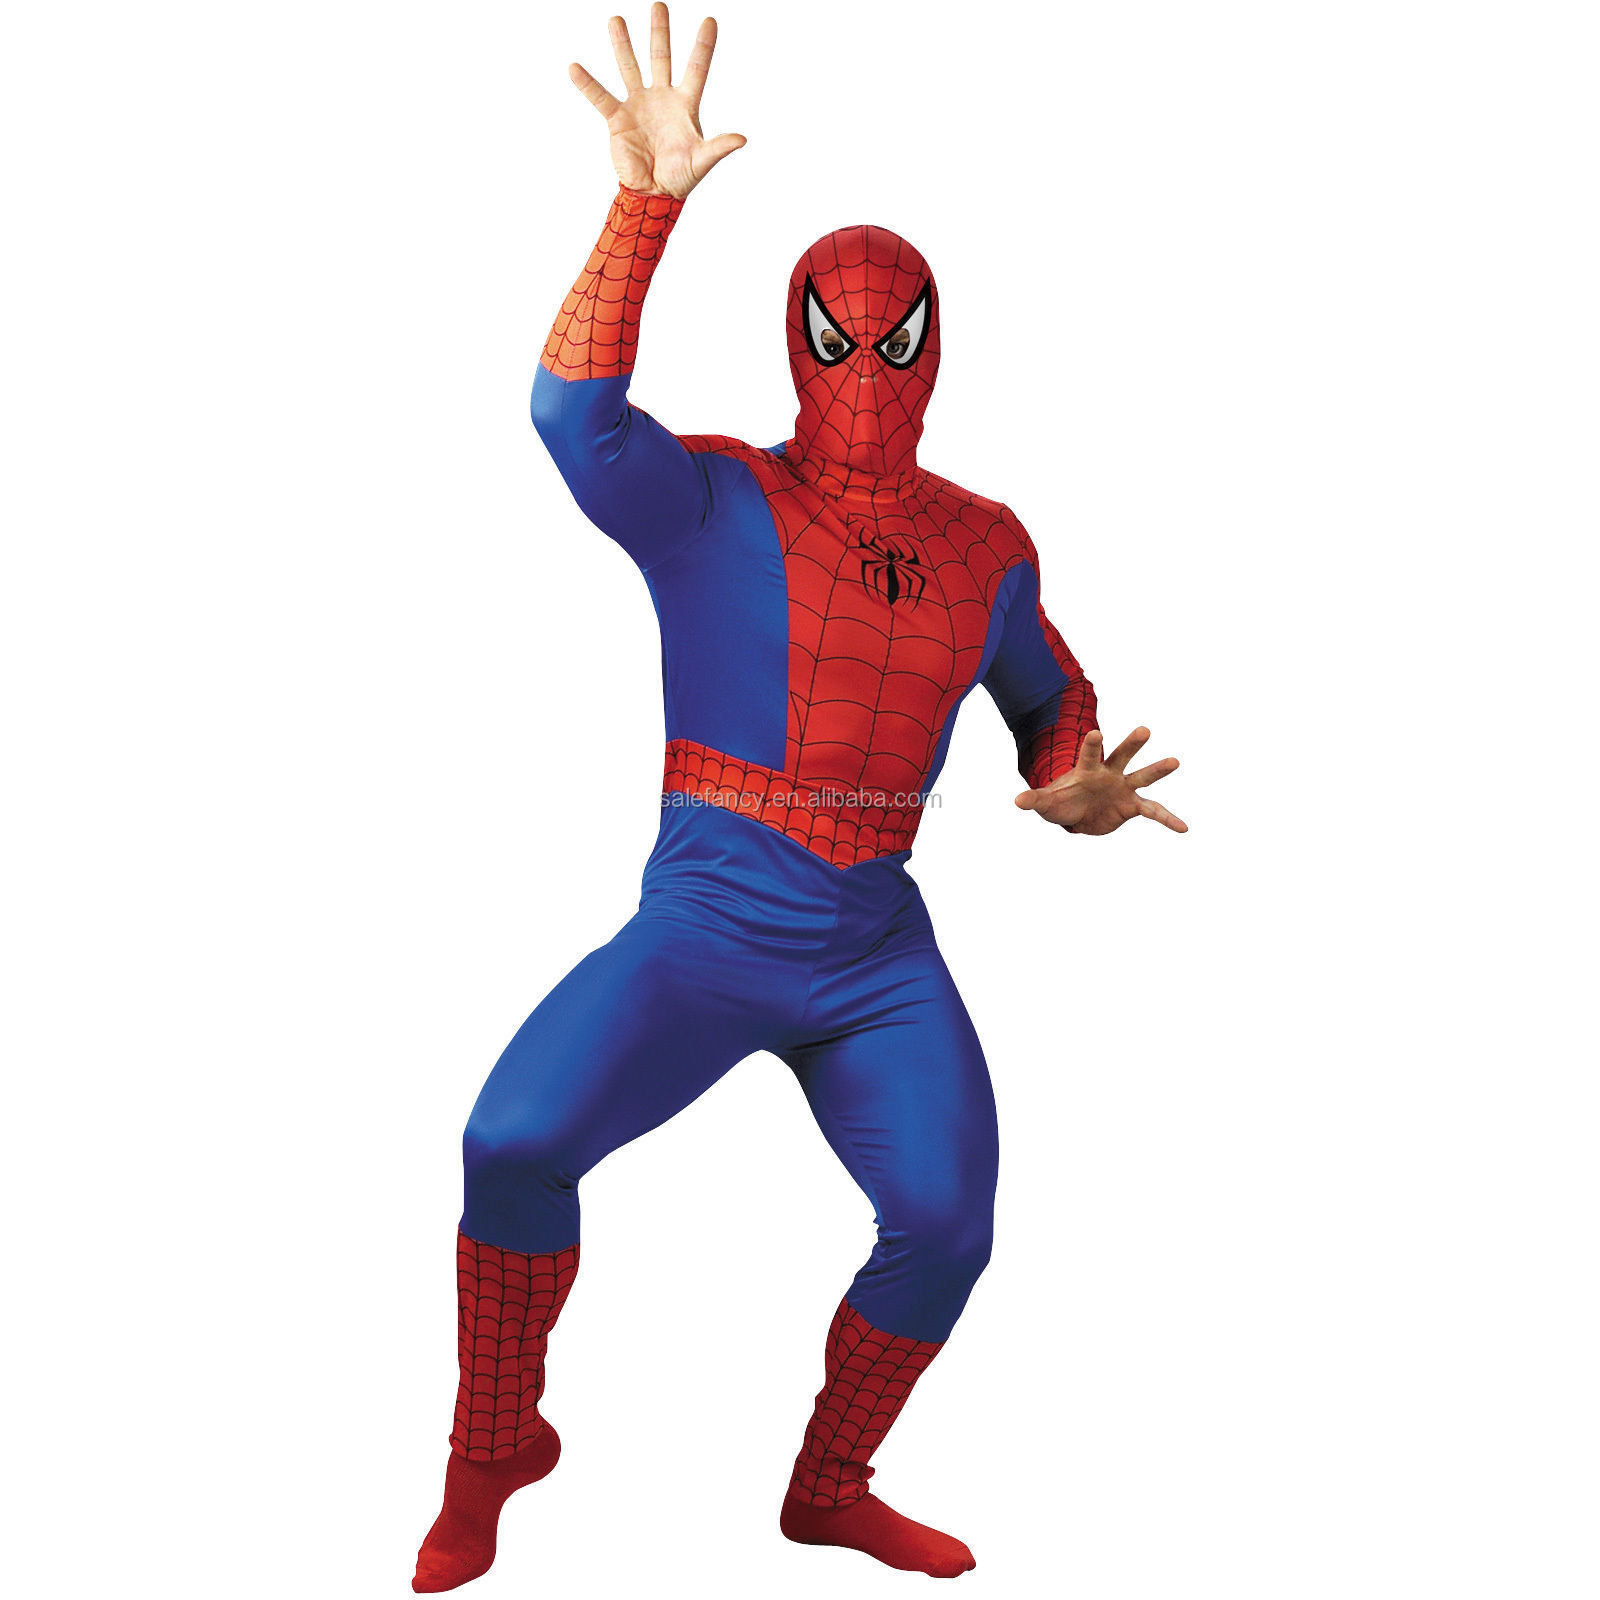 Adult Black Spiderman Costume Spider Man Super Hero Halloween Outfit